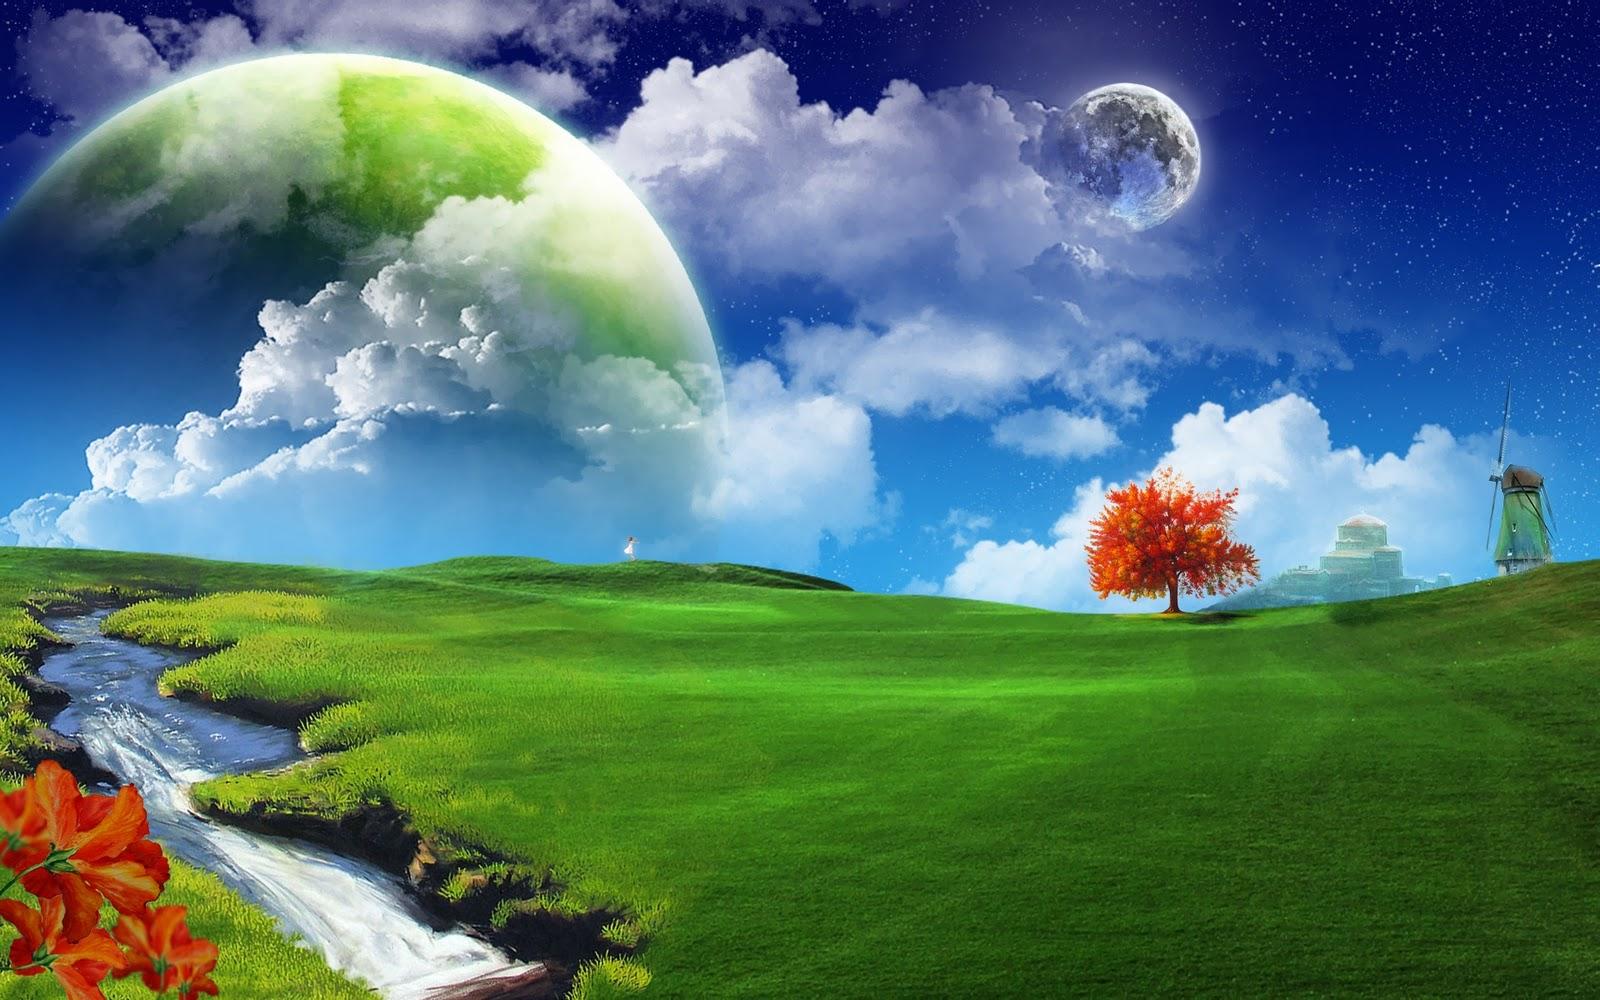 http://2.bp.blogspot.com/_msa0tiUqnHE/TMpYcd_yZnI/AAAAAAAAAeA/pwPoetT-spc/s1600/Drawn_wallpapers_Positive_energy_013748_.jpg